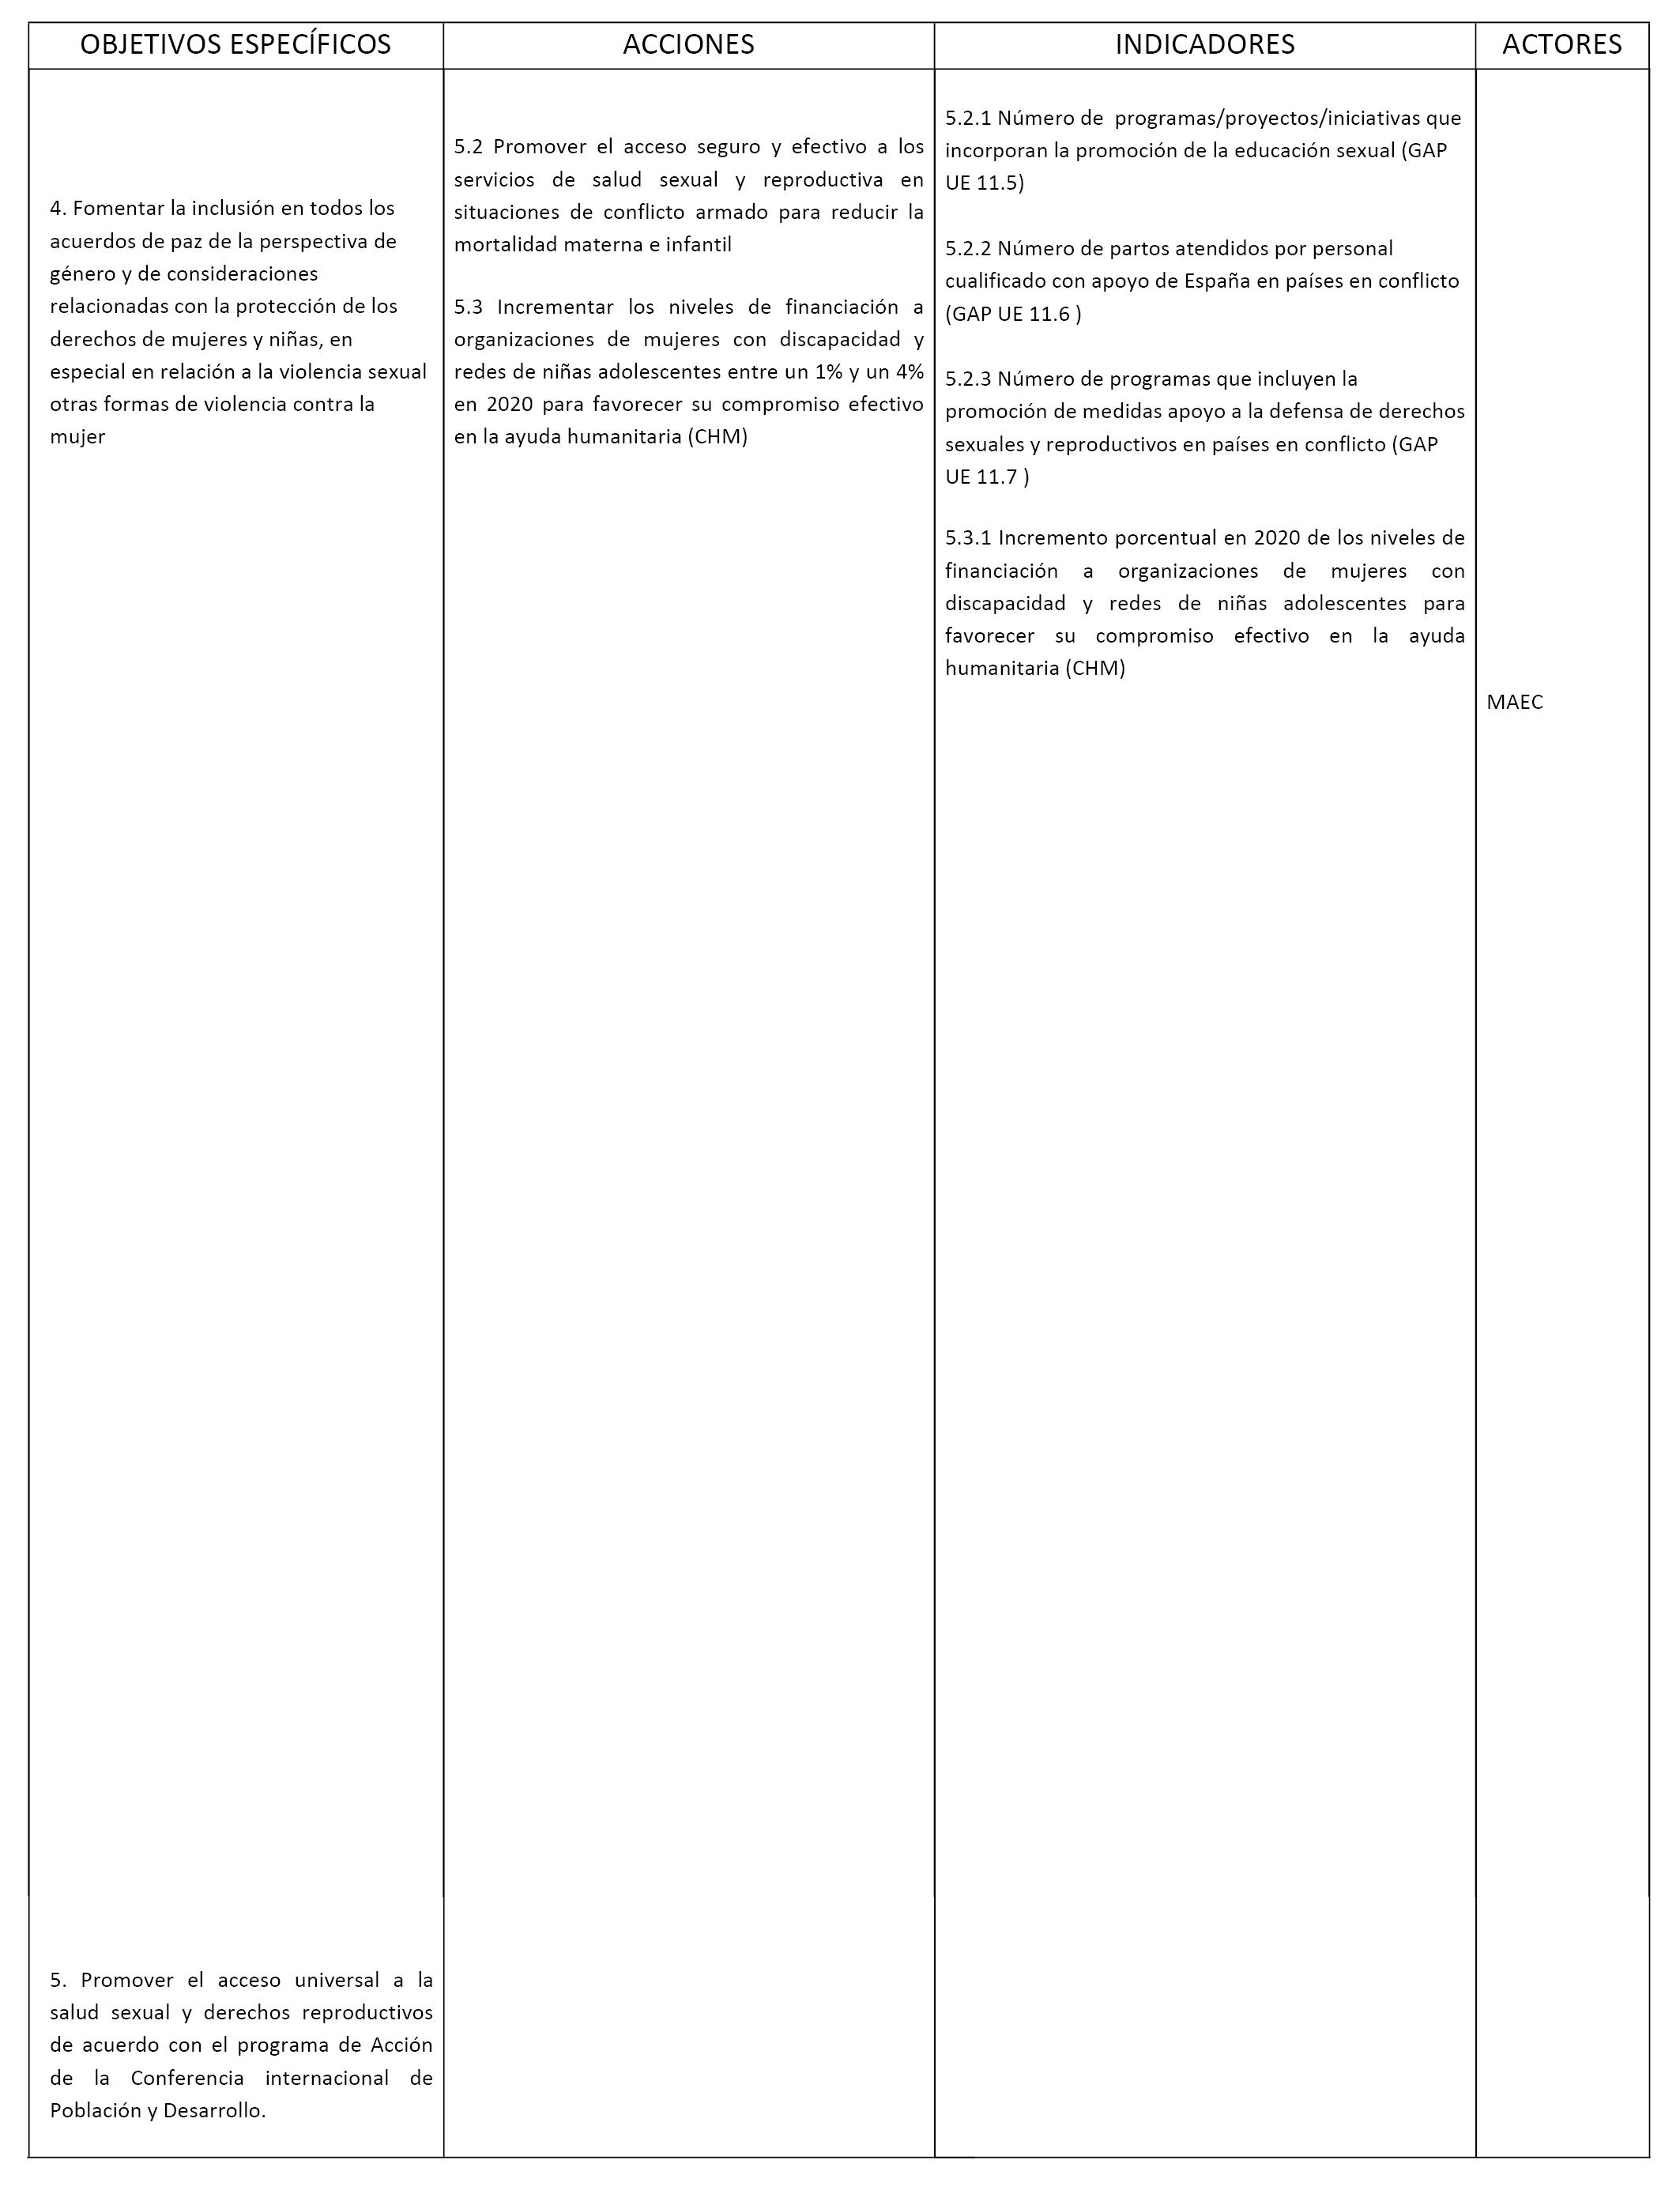 BOE.es - Documento BOE-A-2017-10517